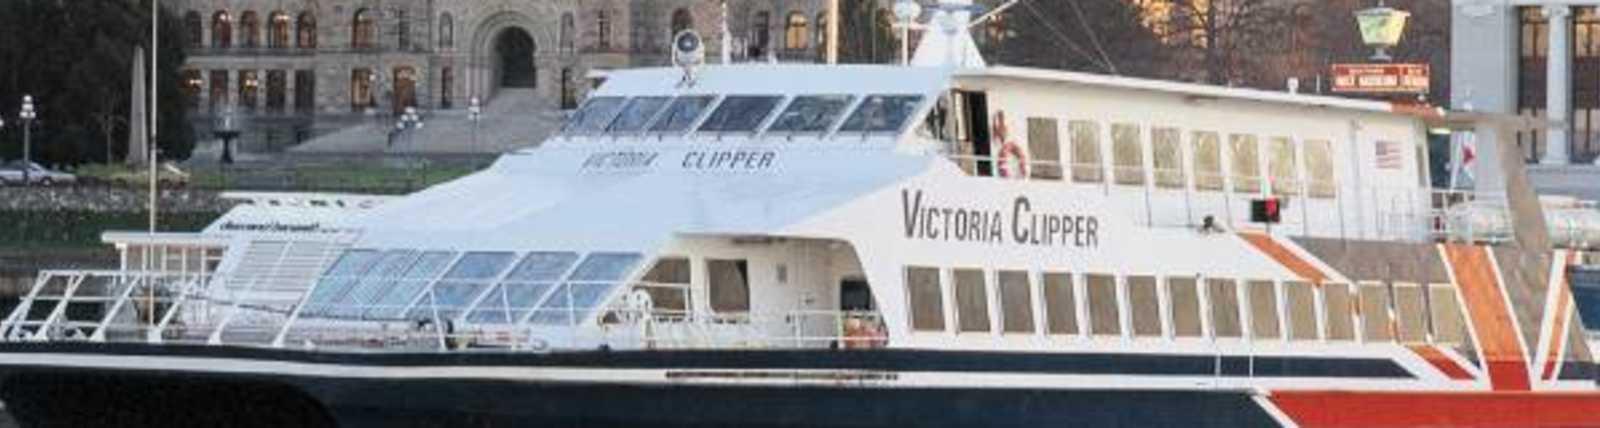 Victoria_Clipper-5.jpeg